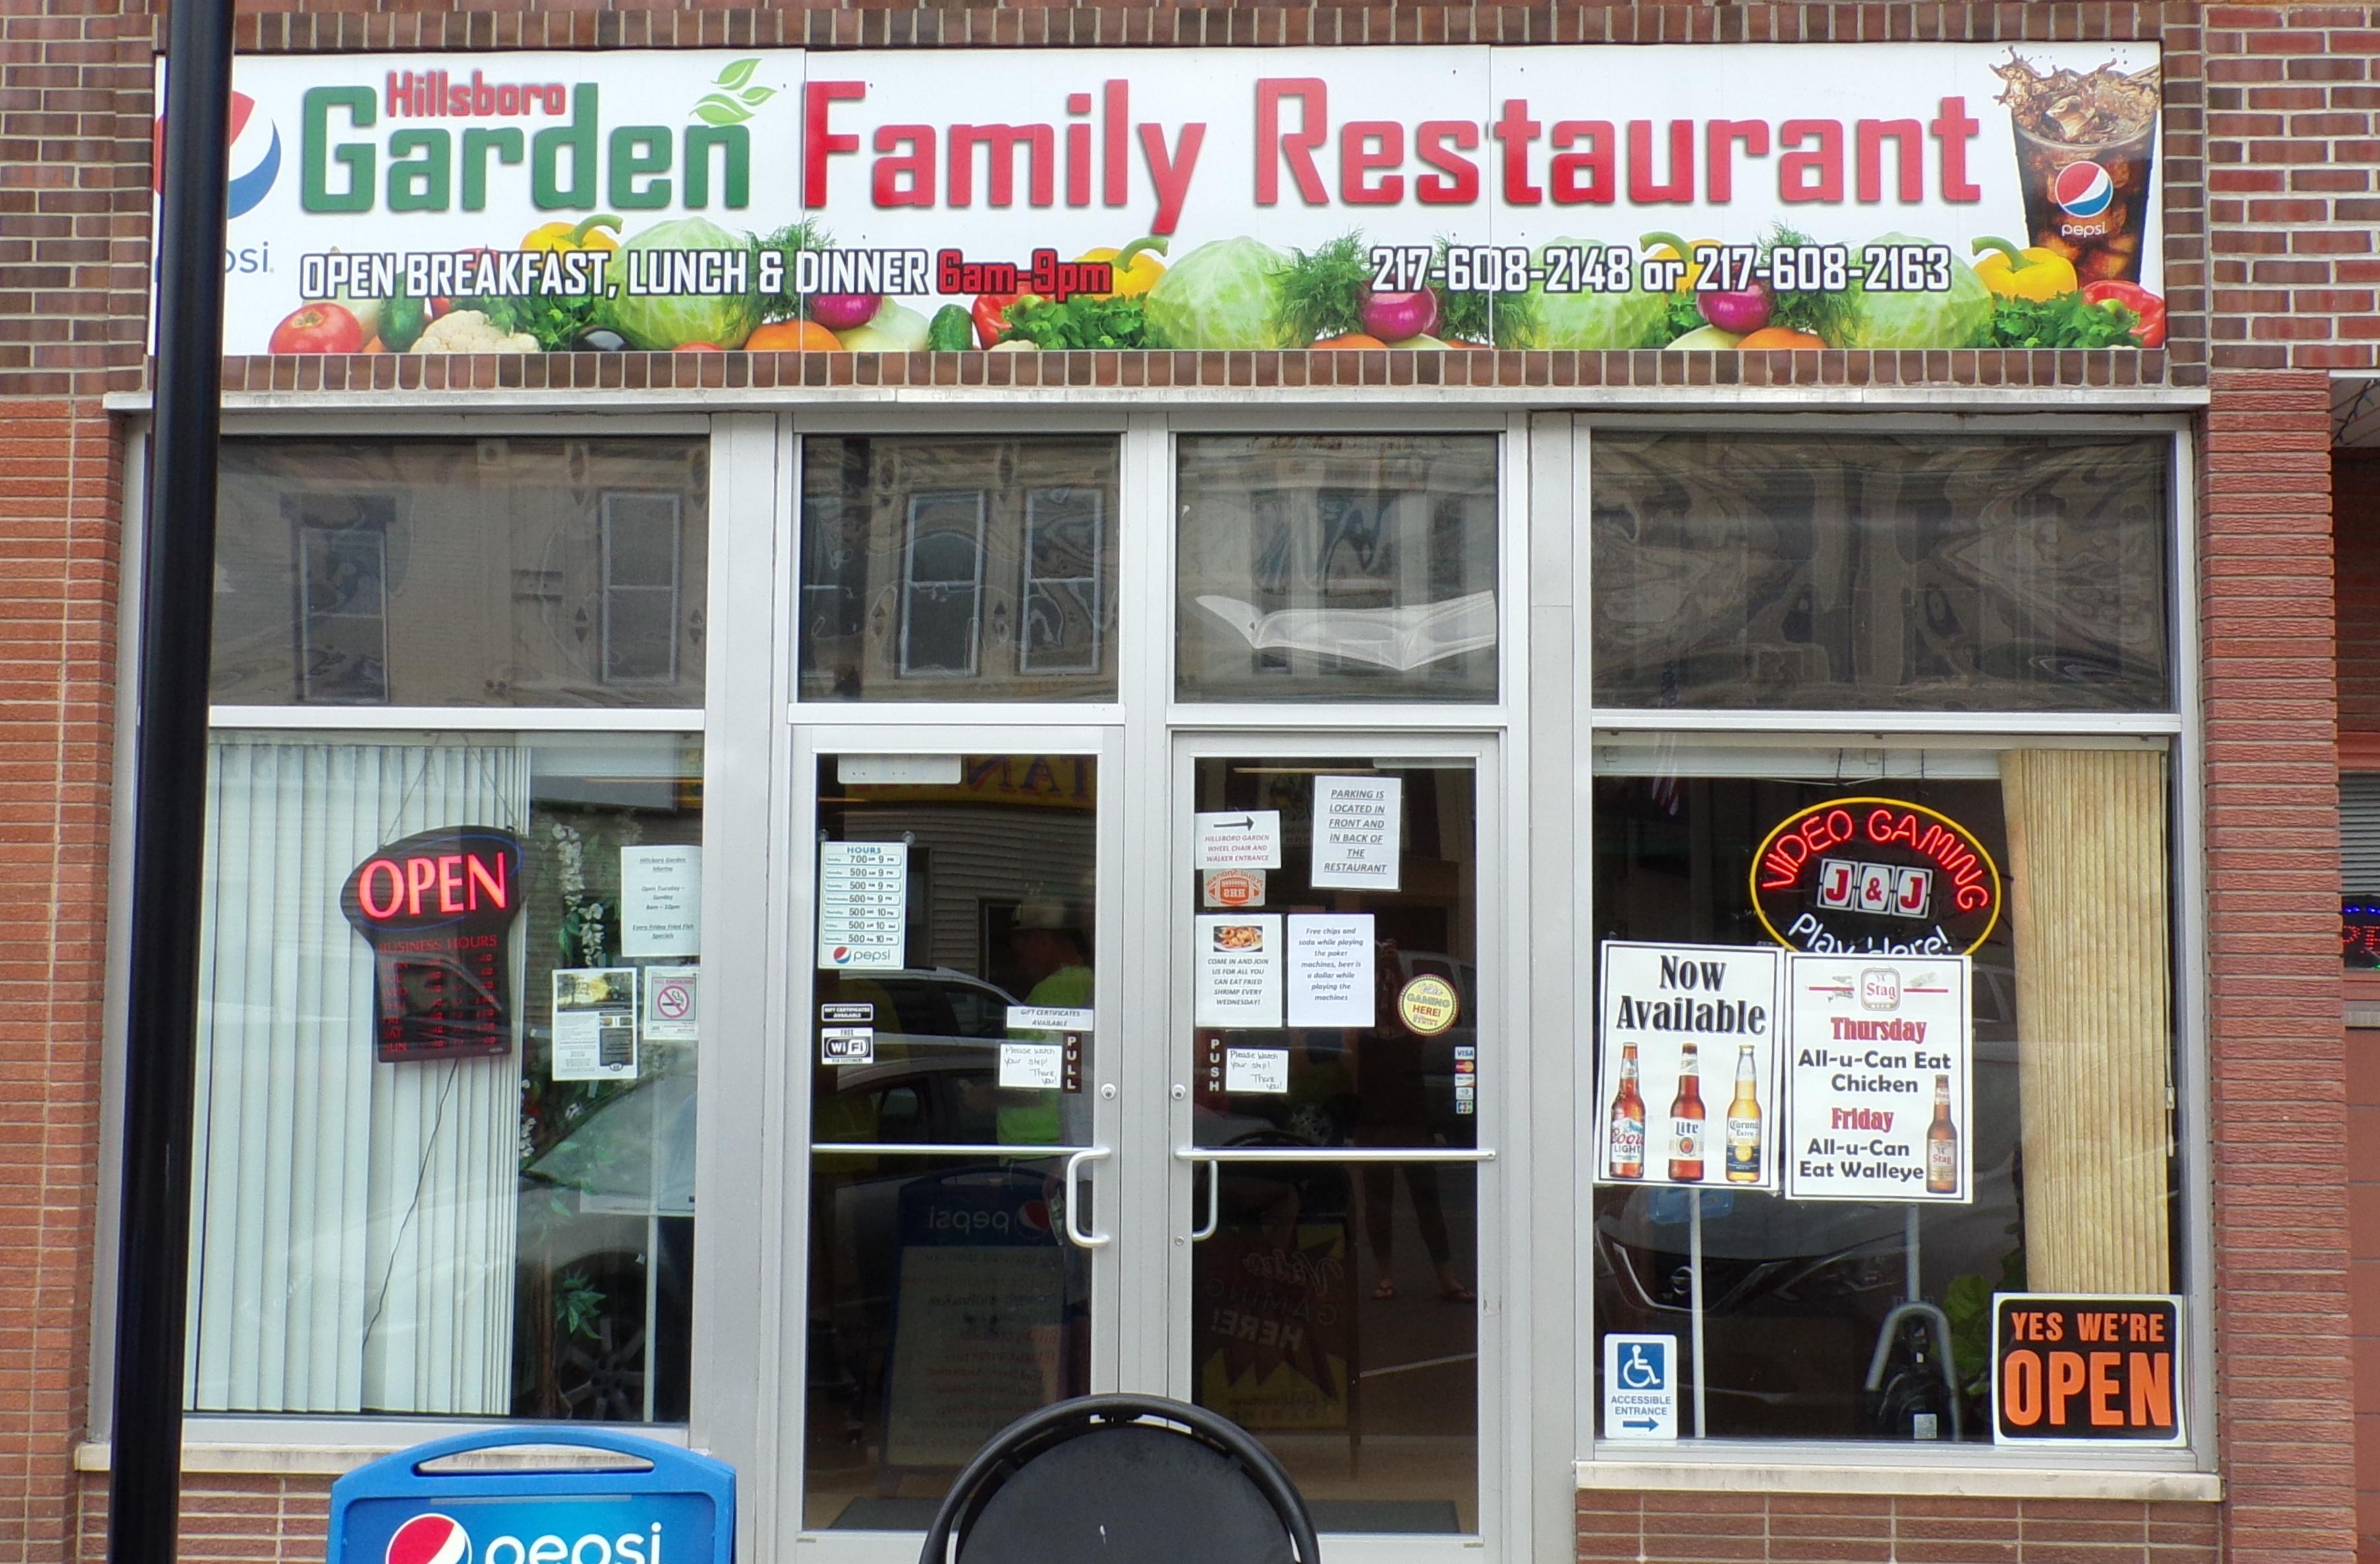 Garden Family Restaurant Enjoy Illinois